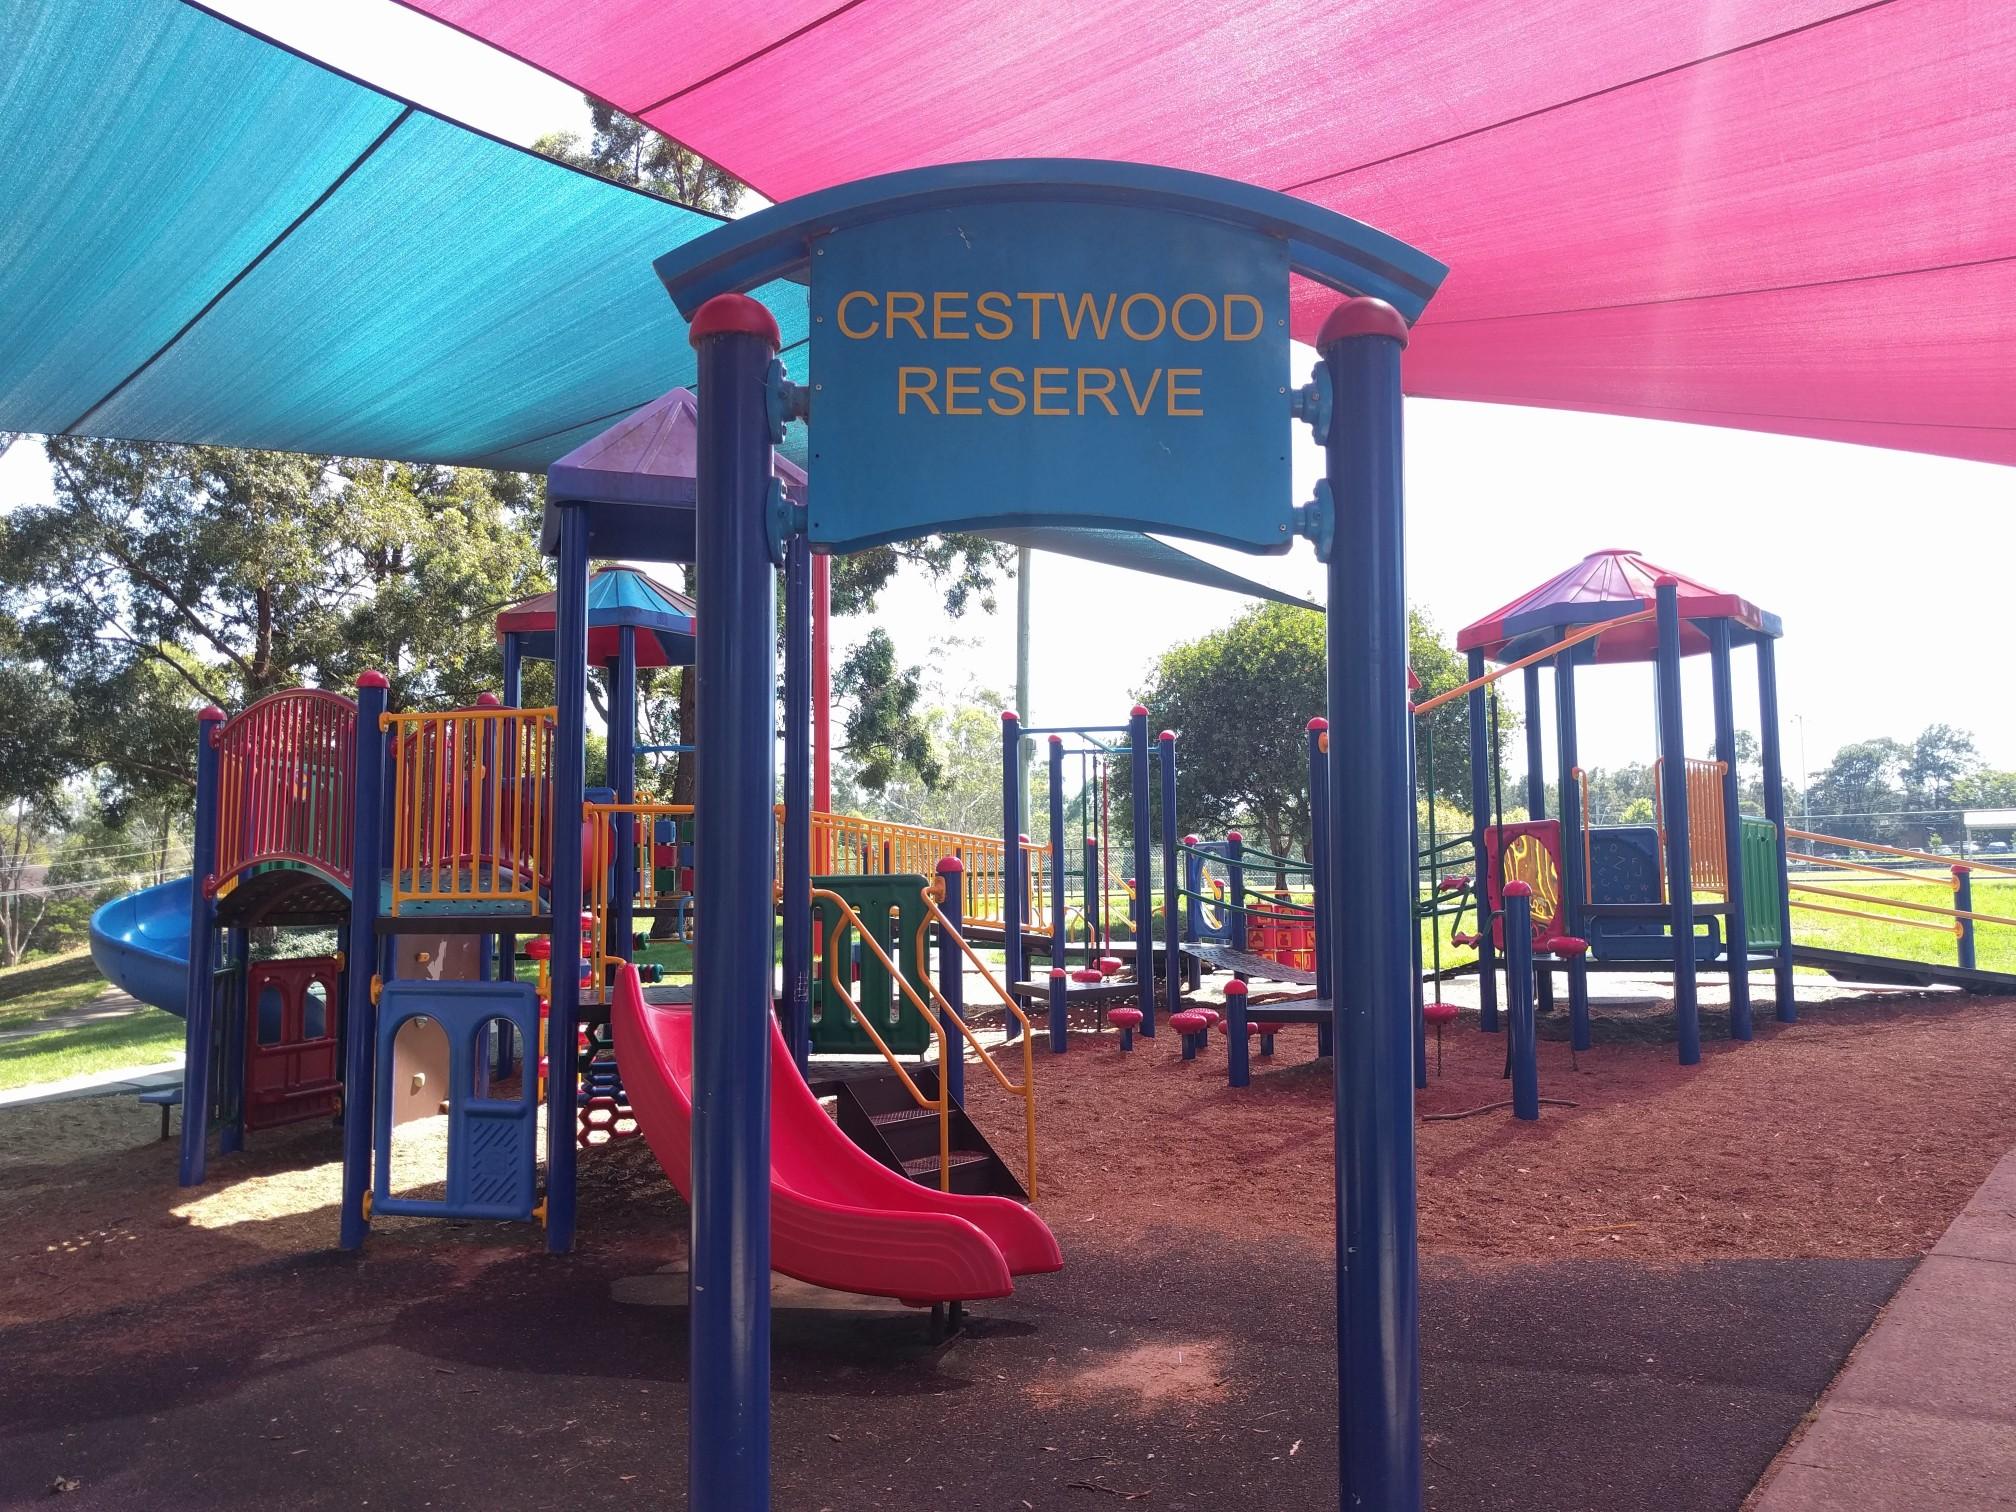 Crestwood Reserve